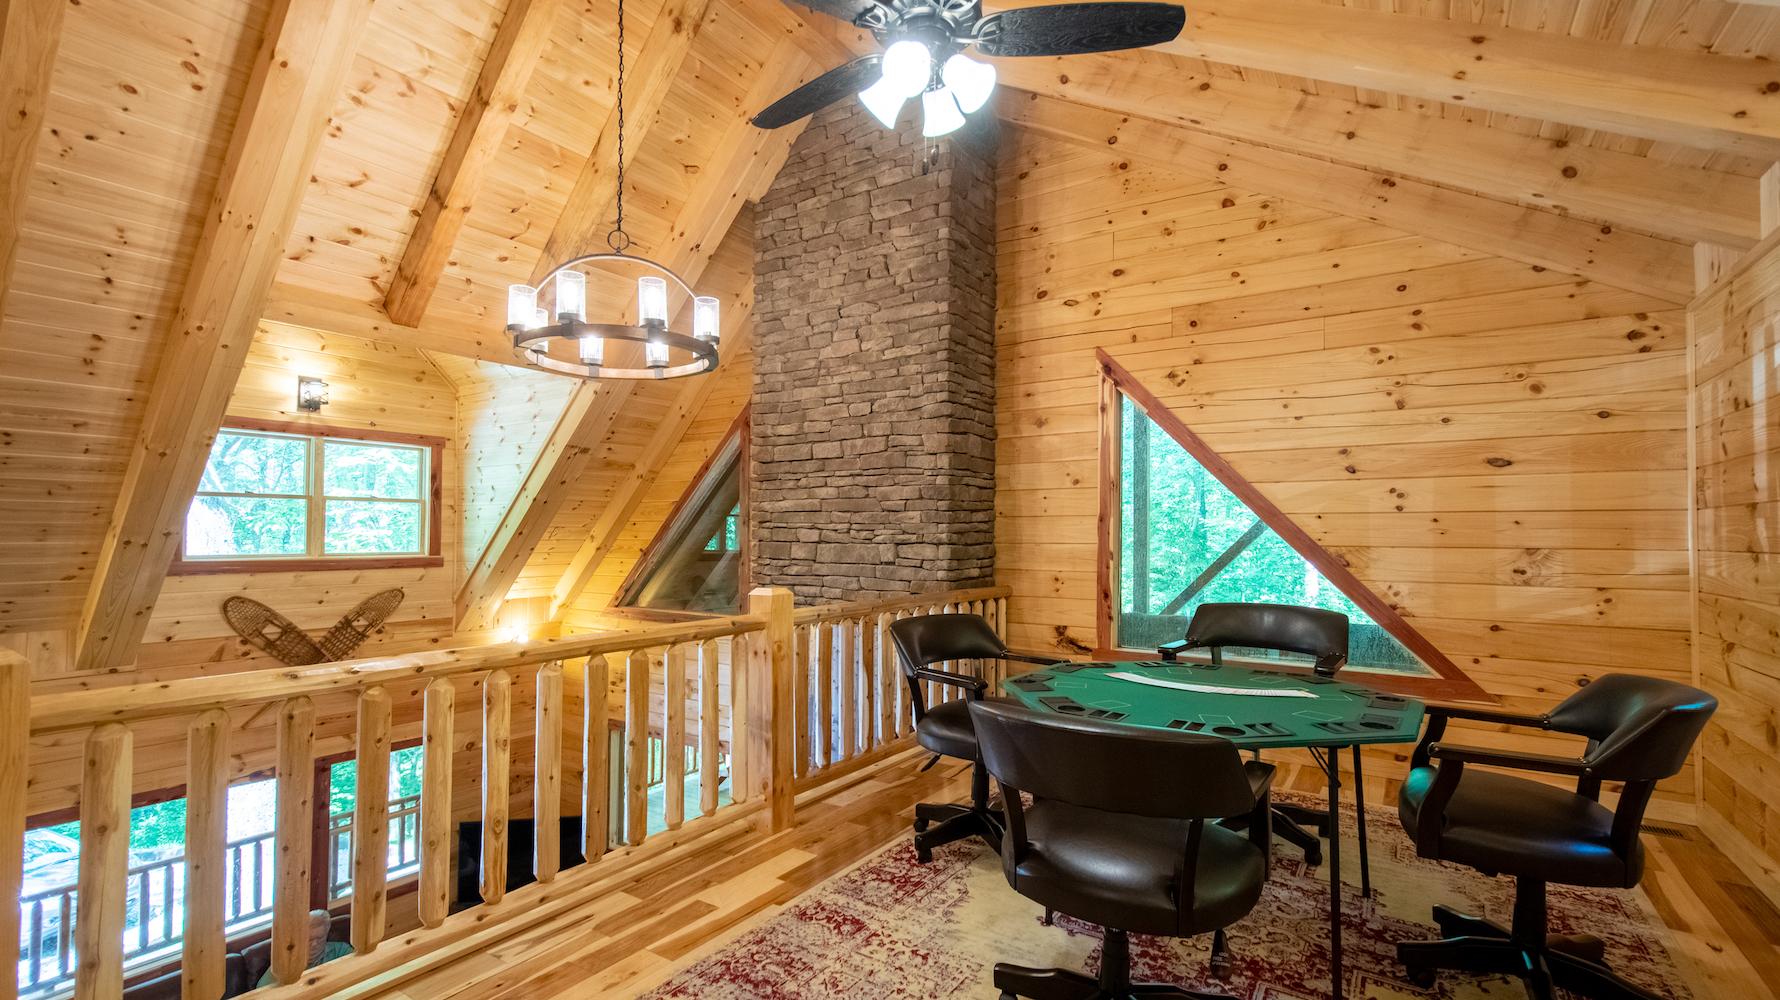 AHL loft poker table/puzzle table - AHL loft poker table/puzzle table